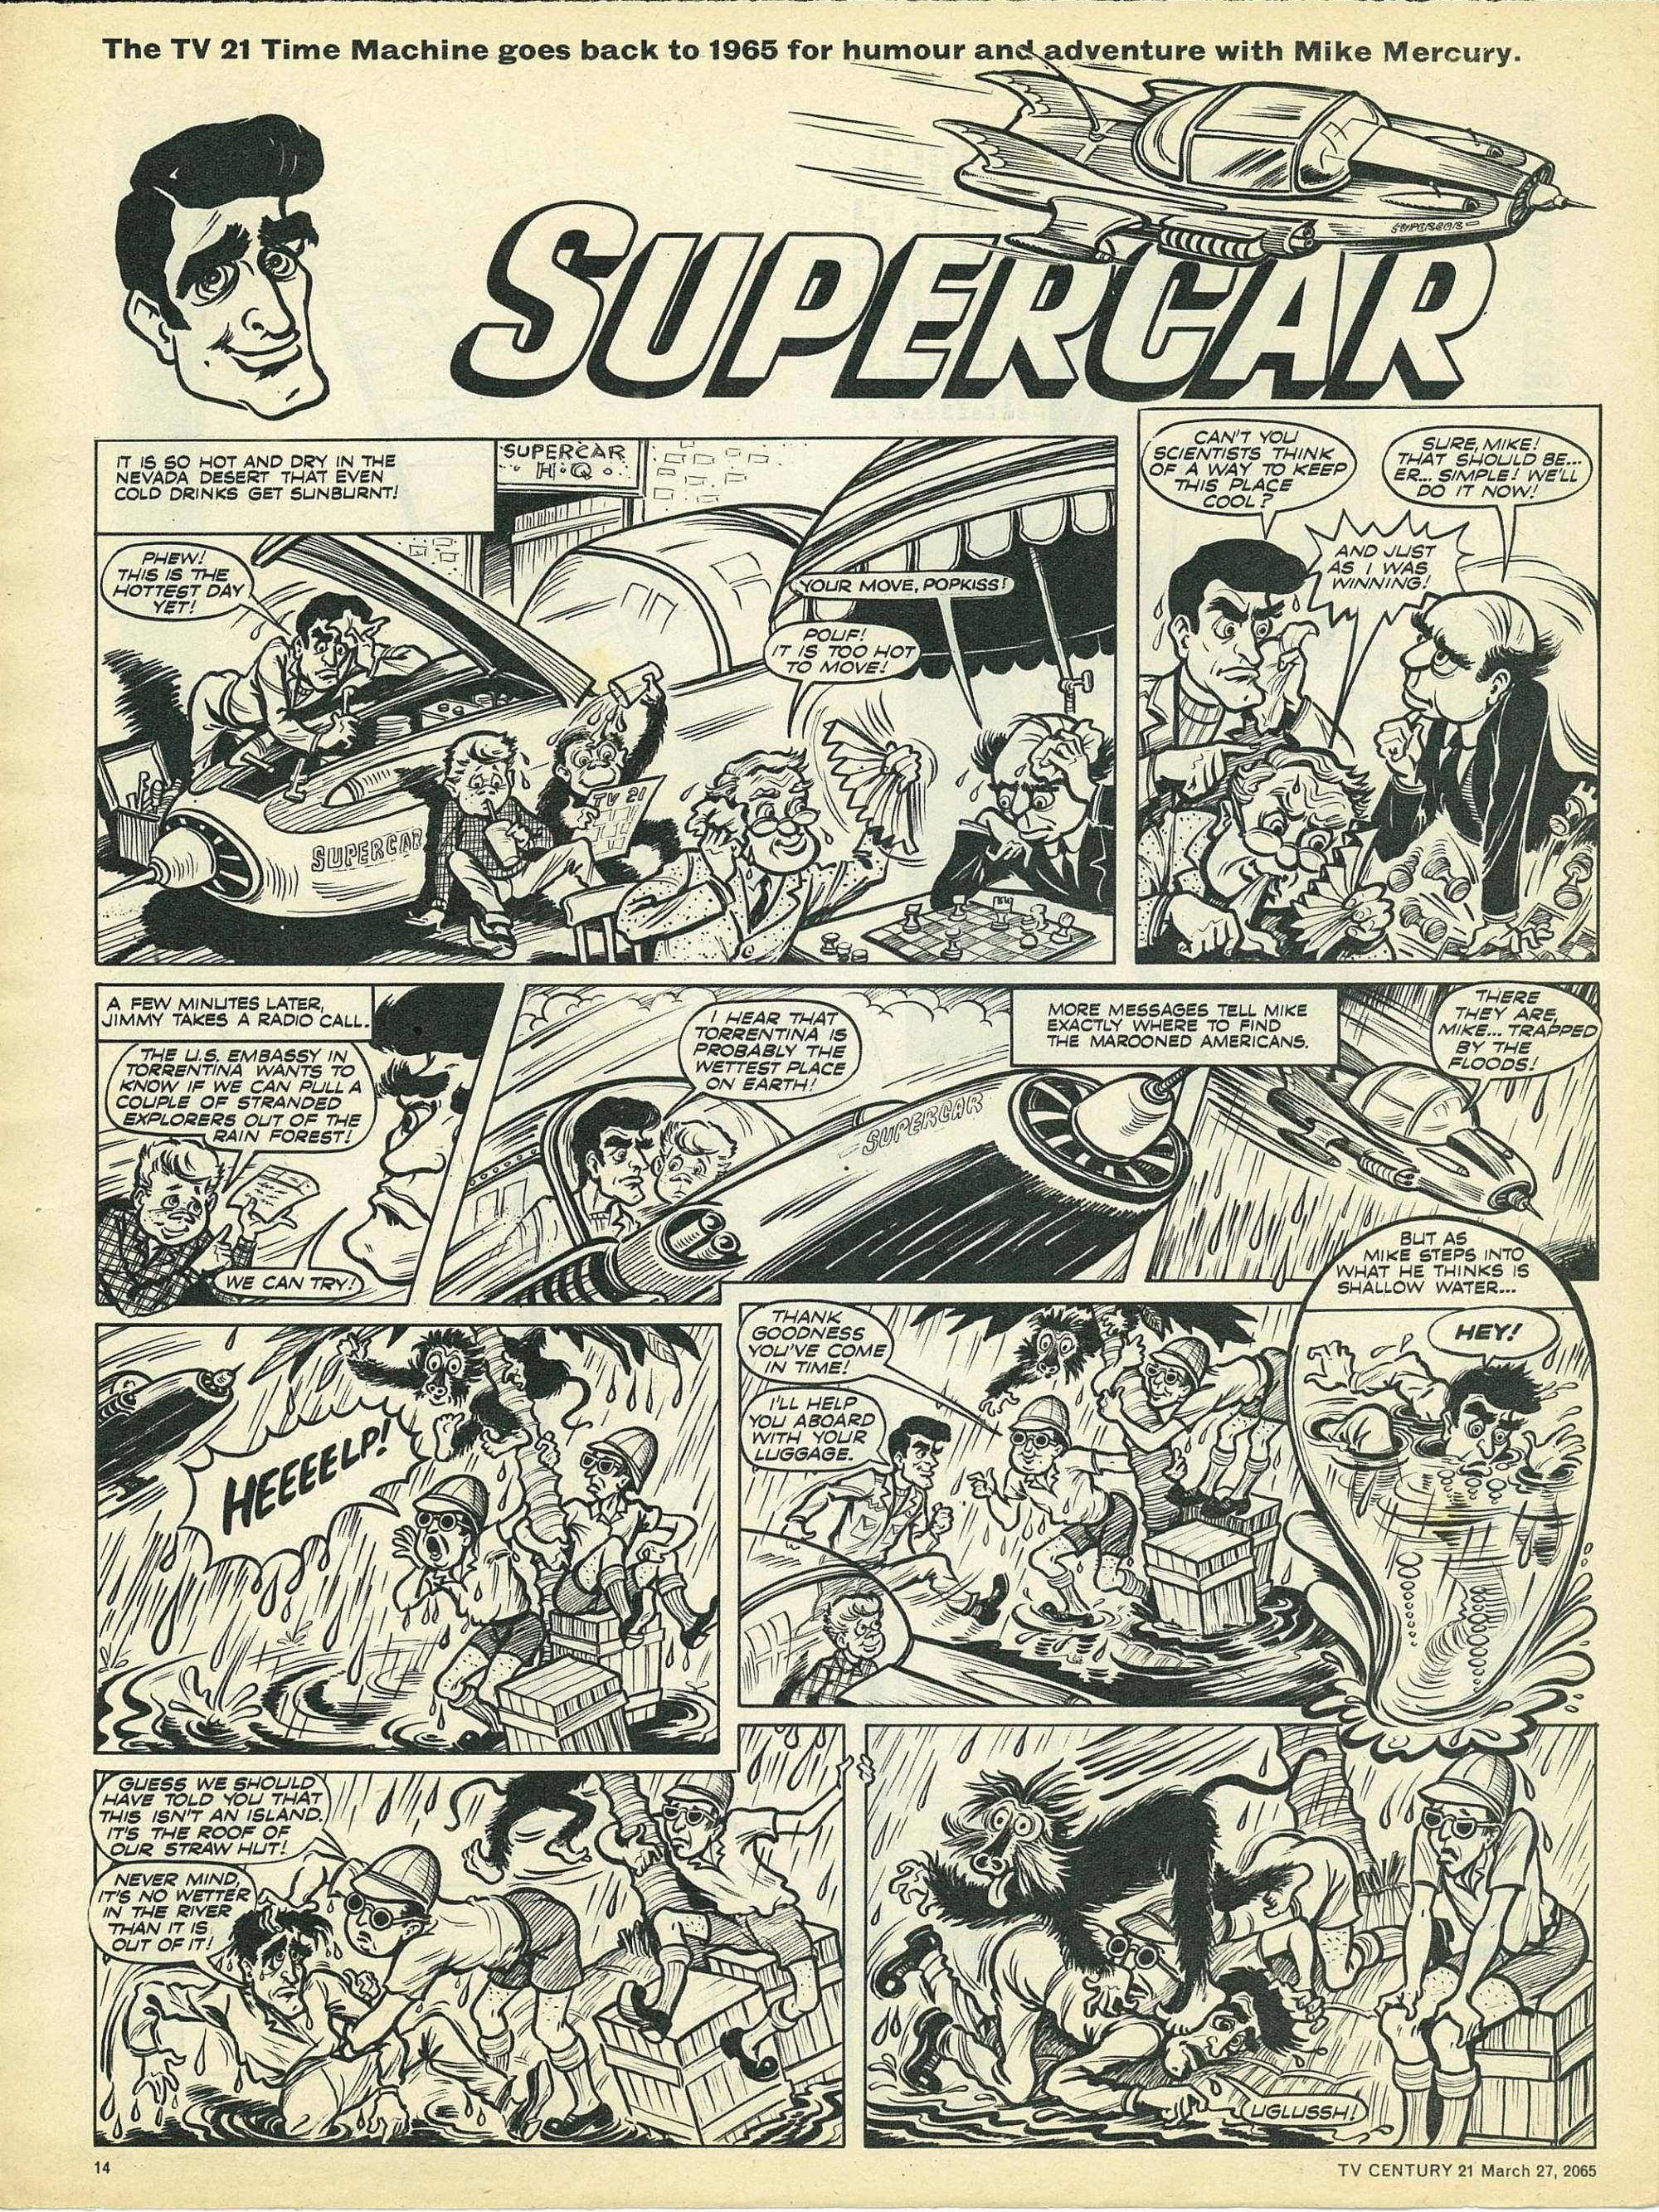 Read online TV Century 21 (TV 21) comic -  Issue #10 - 13